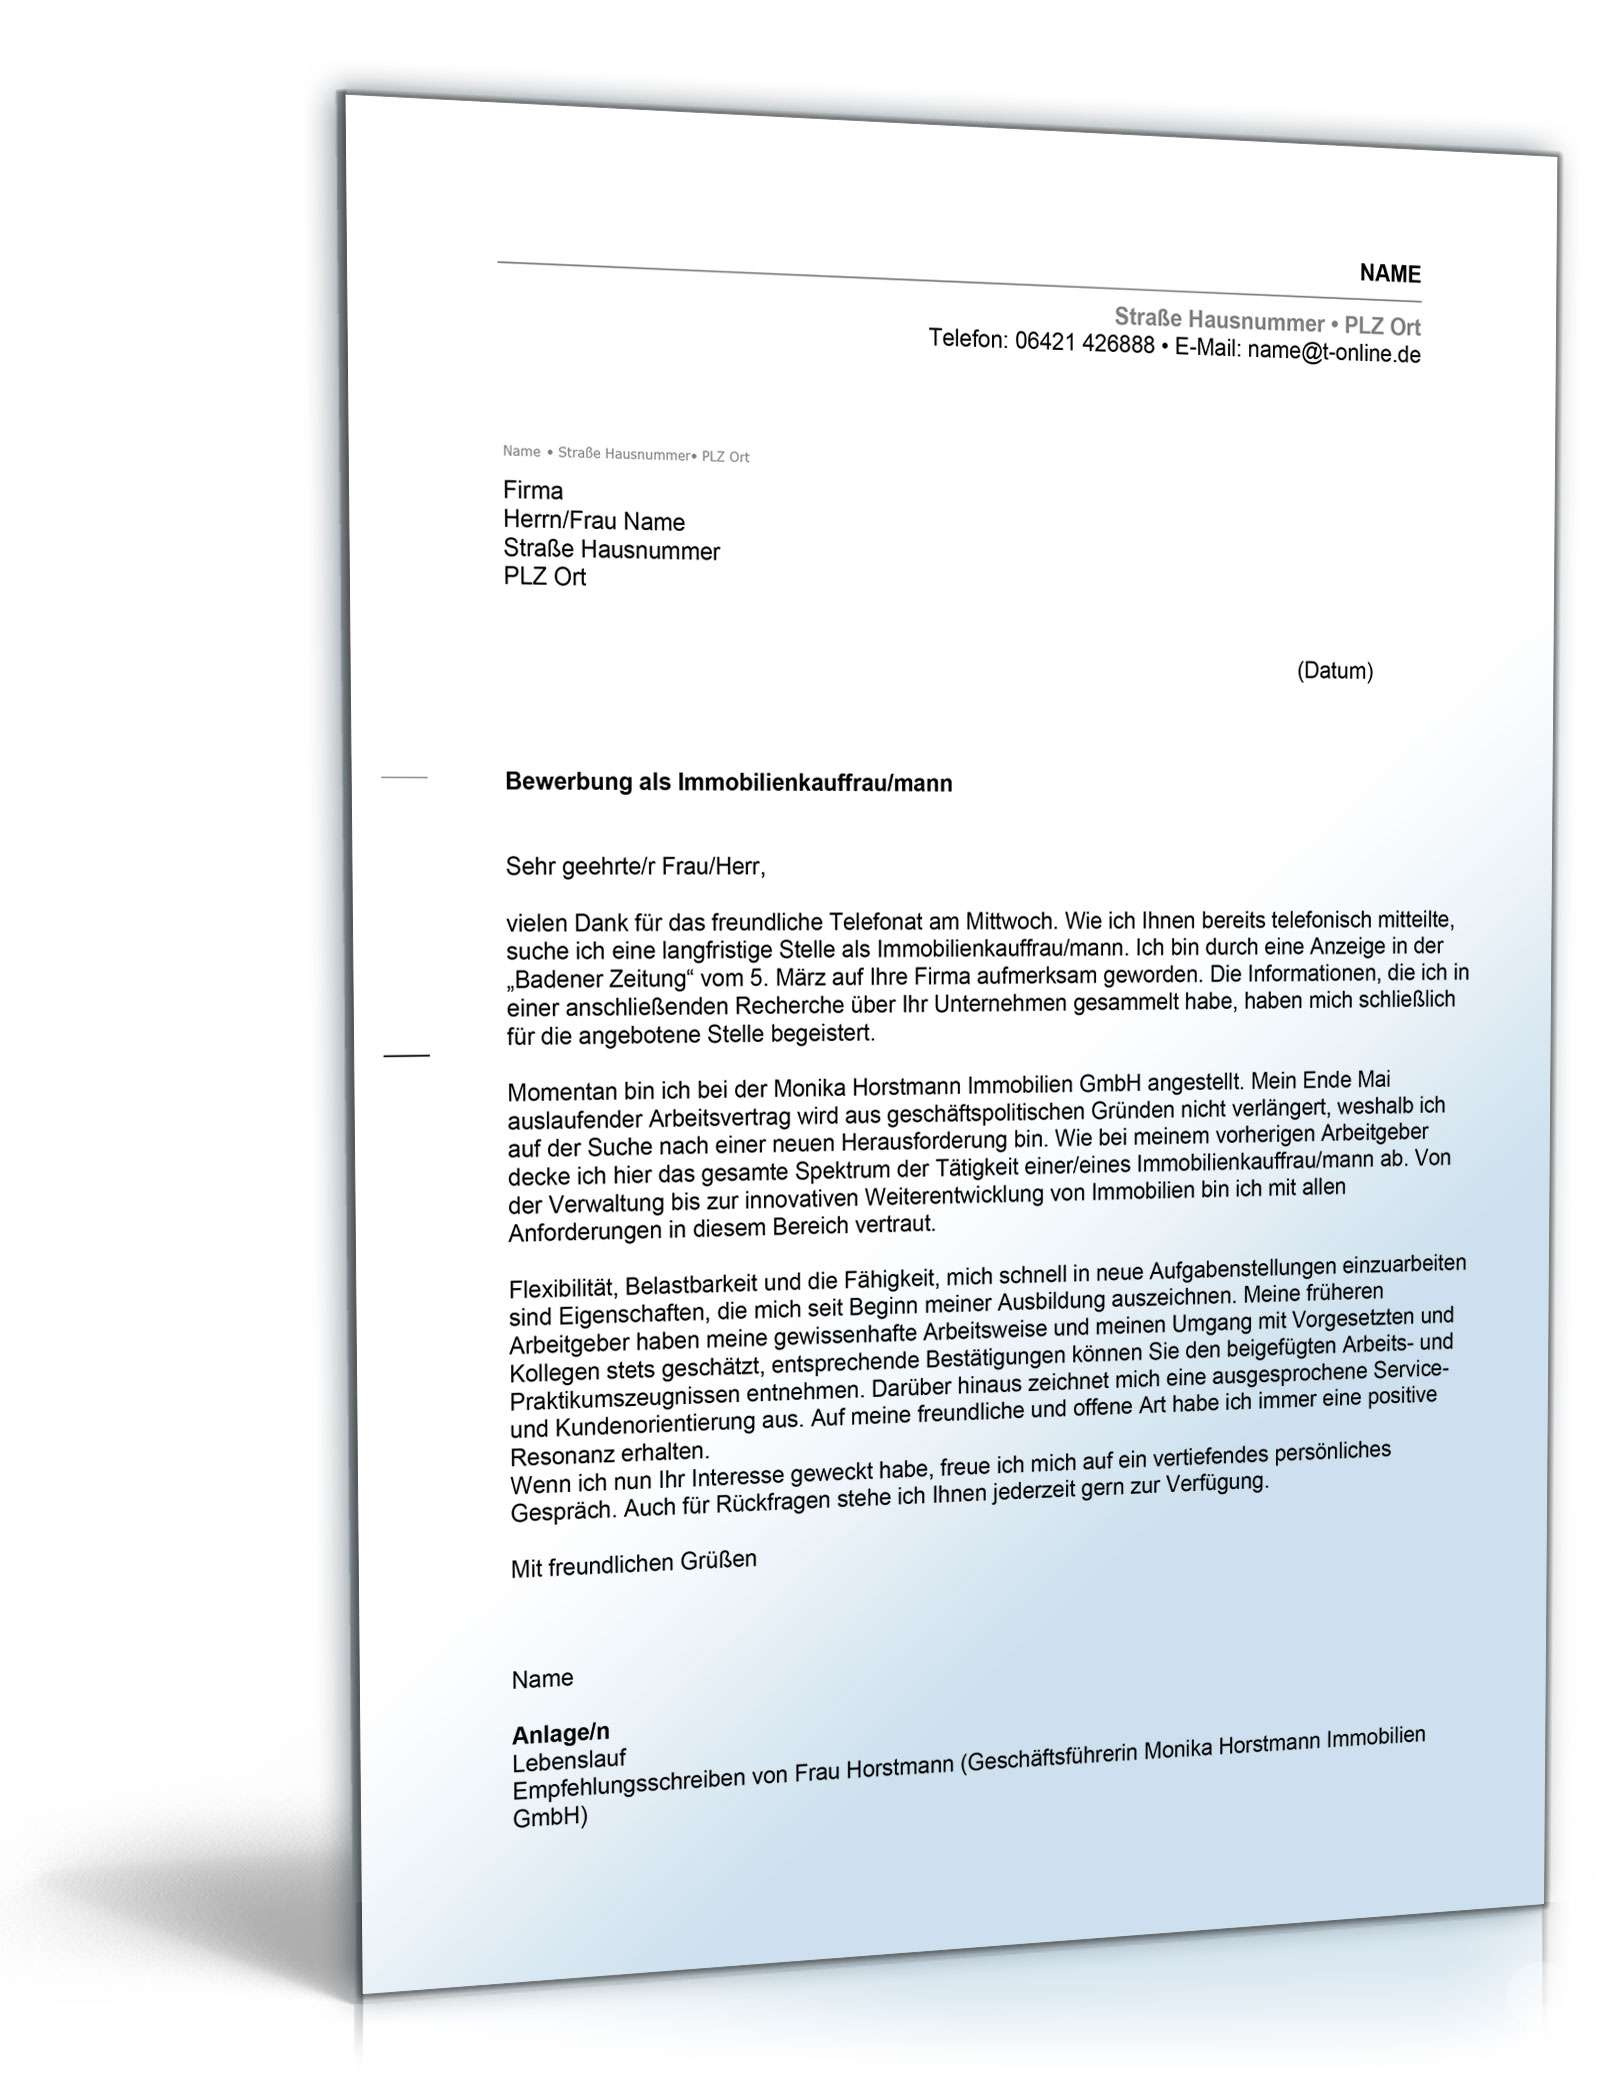 anschreiben bewerbung immobilienkaufmann - Immobilienkaufmann Bewerbung